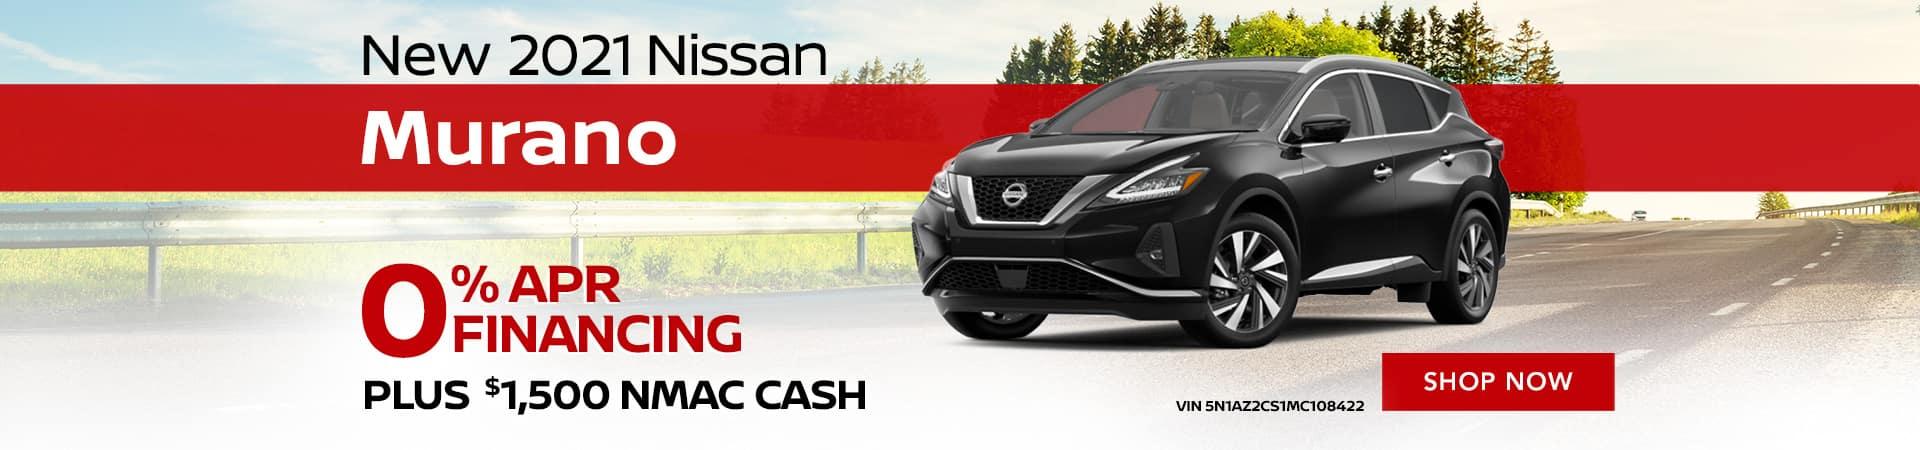 JRN_1920x450_New 2021 Nissan Murano __06'21